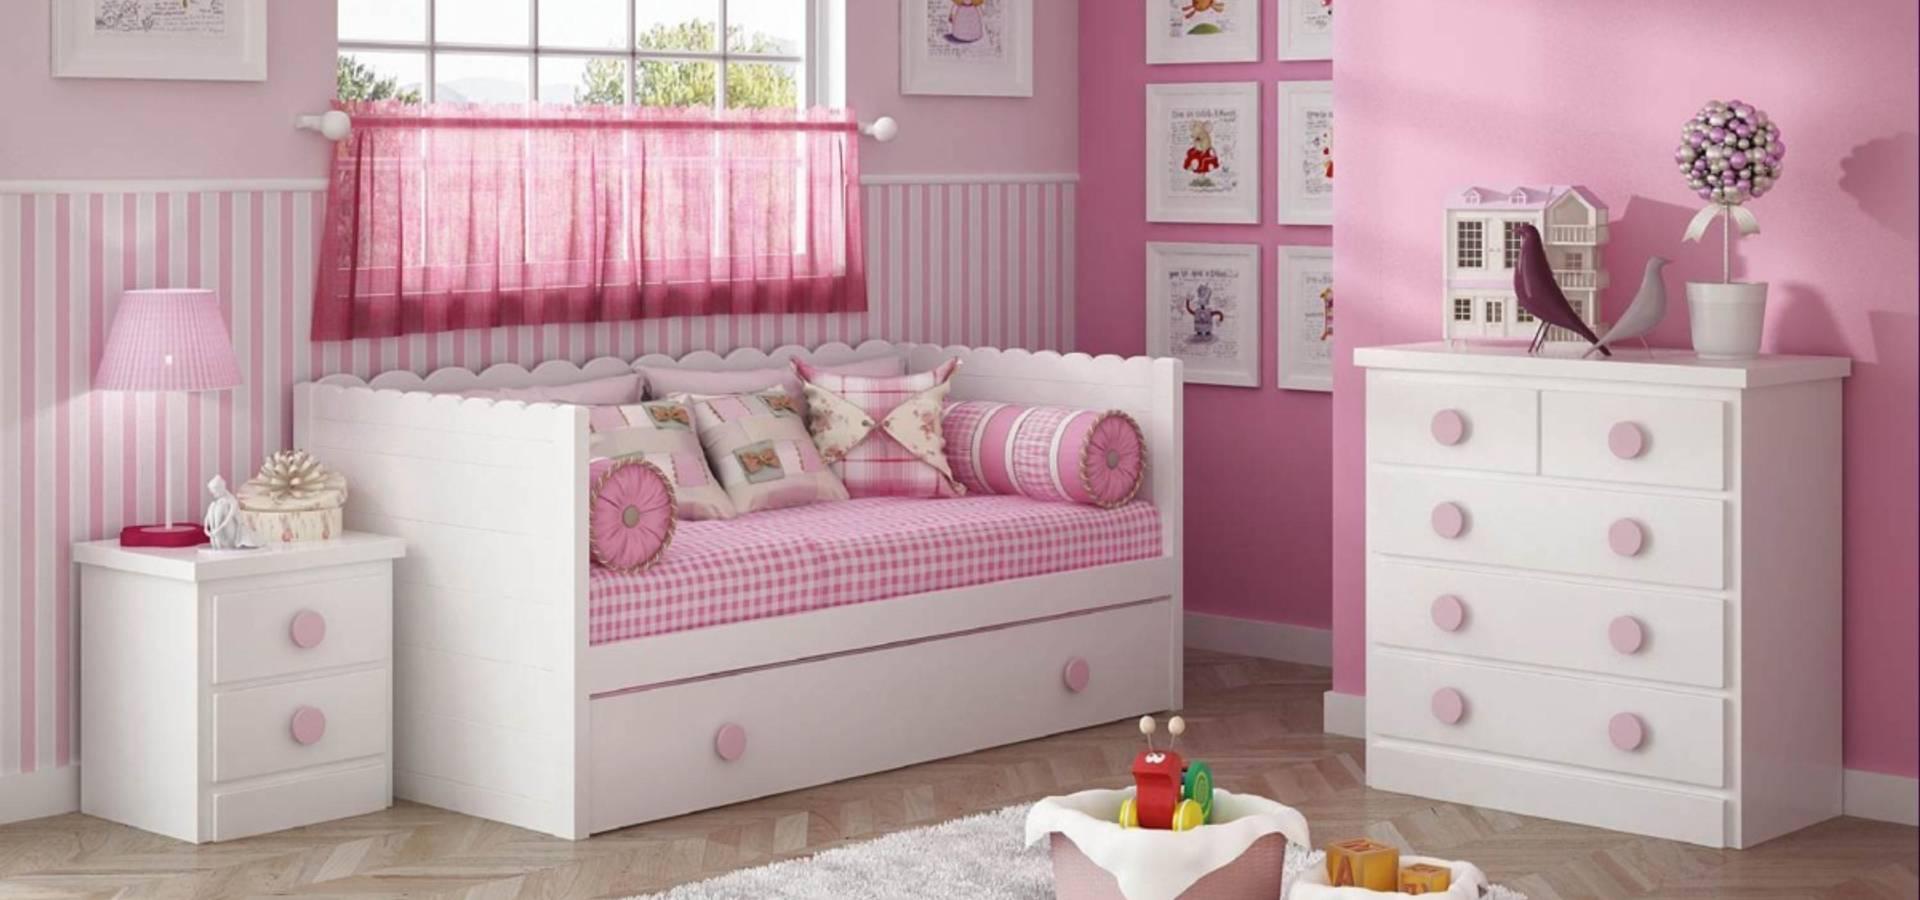 Cama nido para dormitorios infantiles de muebles noel for Muebles de dormitorio infantil